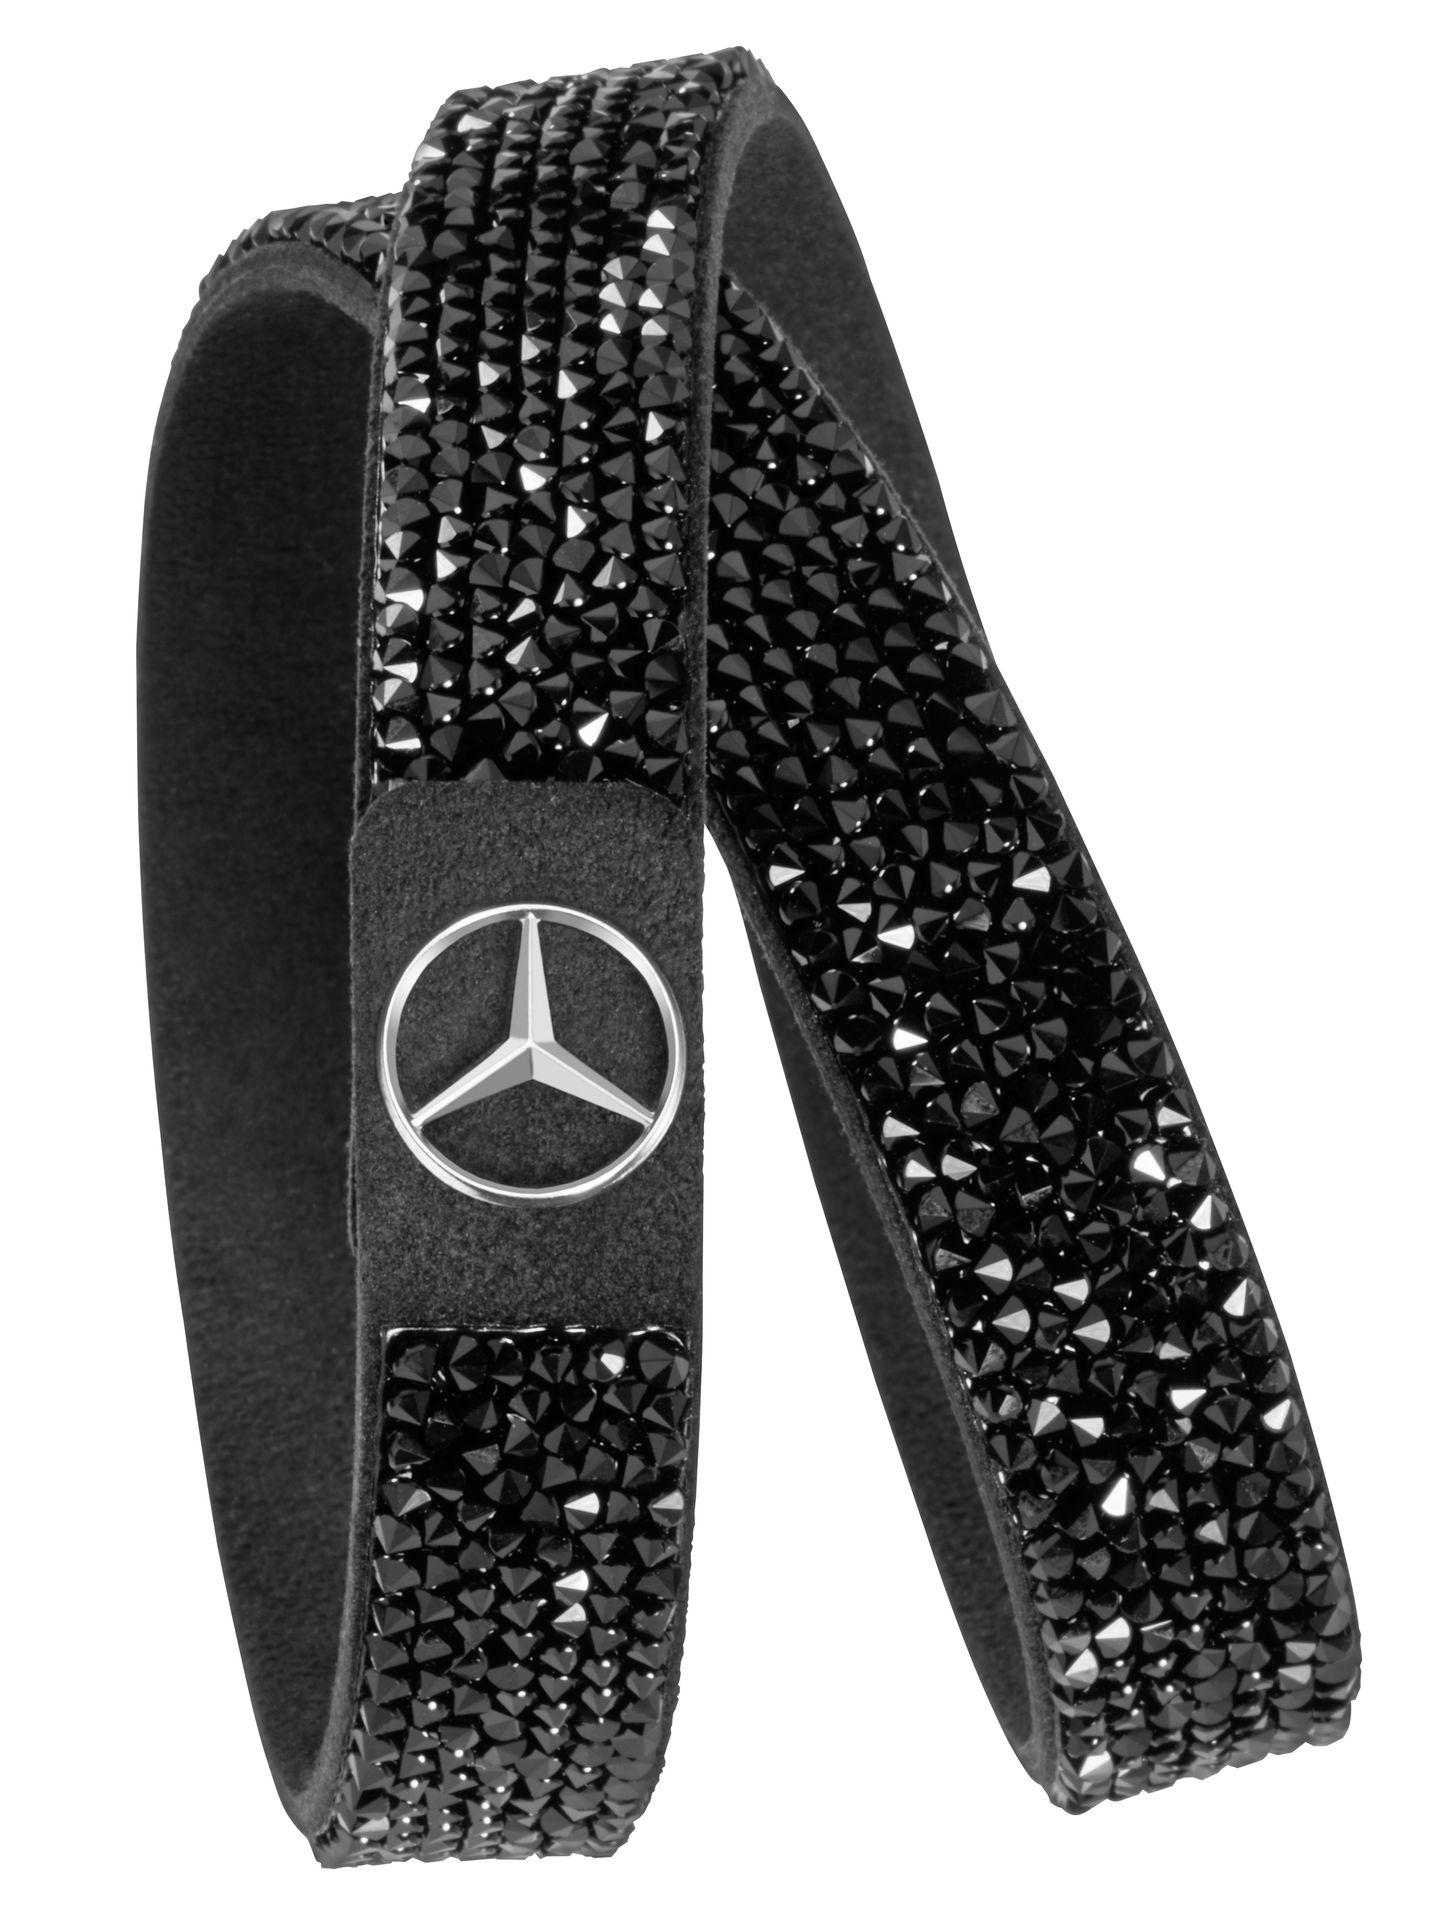 Женский браслет Mercedes Women's Bracelet, Milano, Swarovski